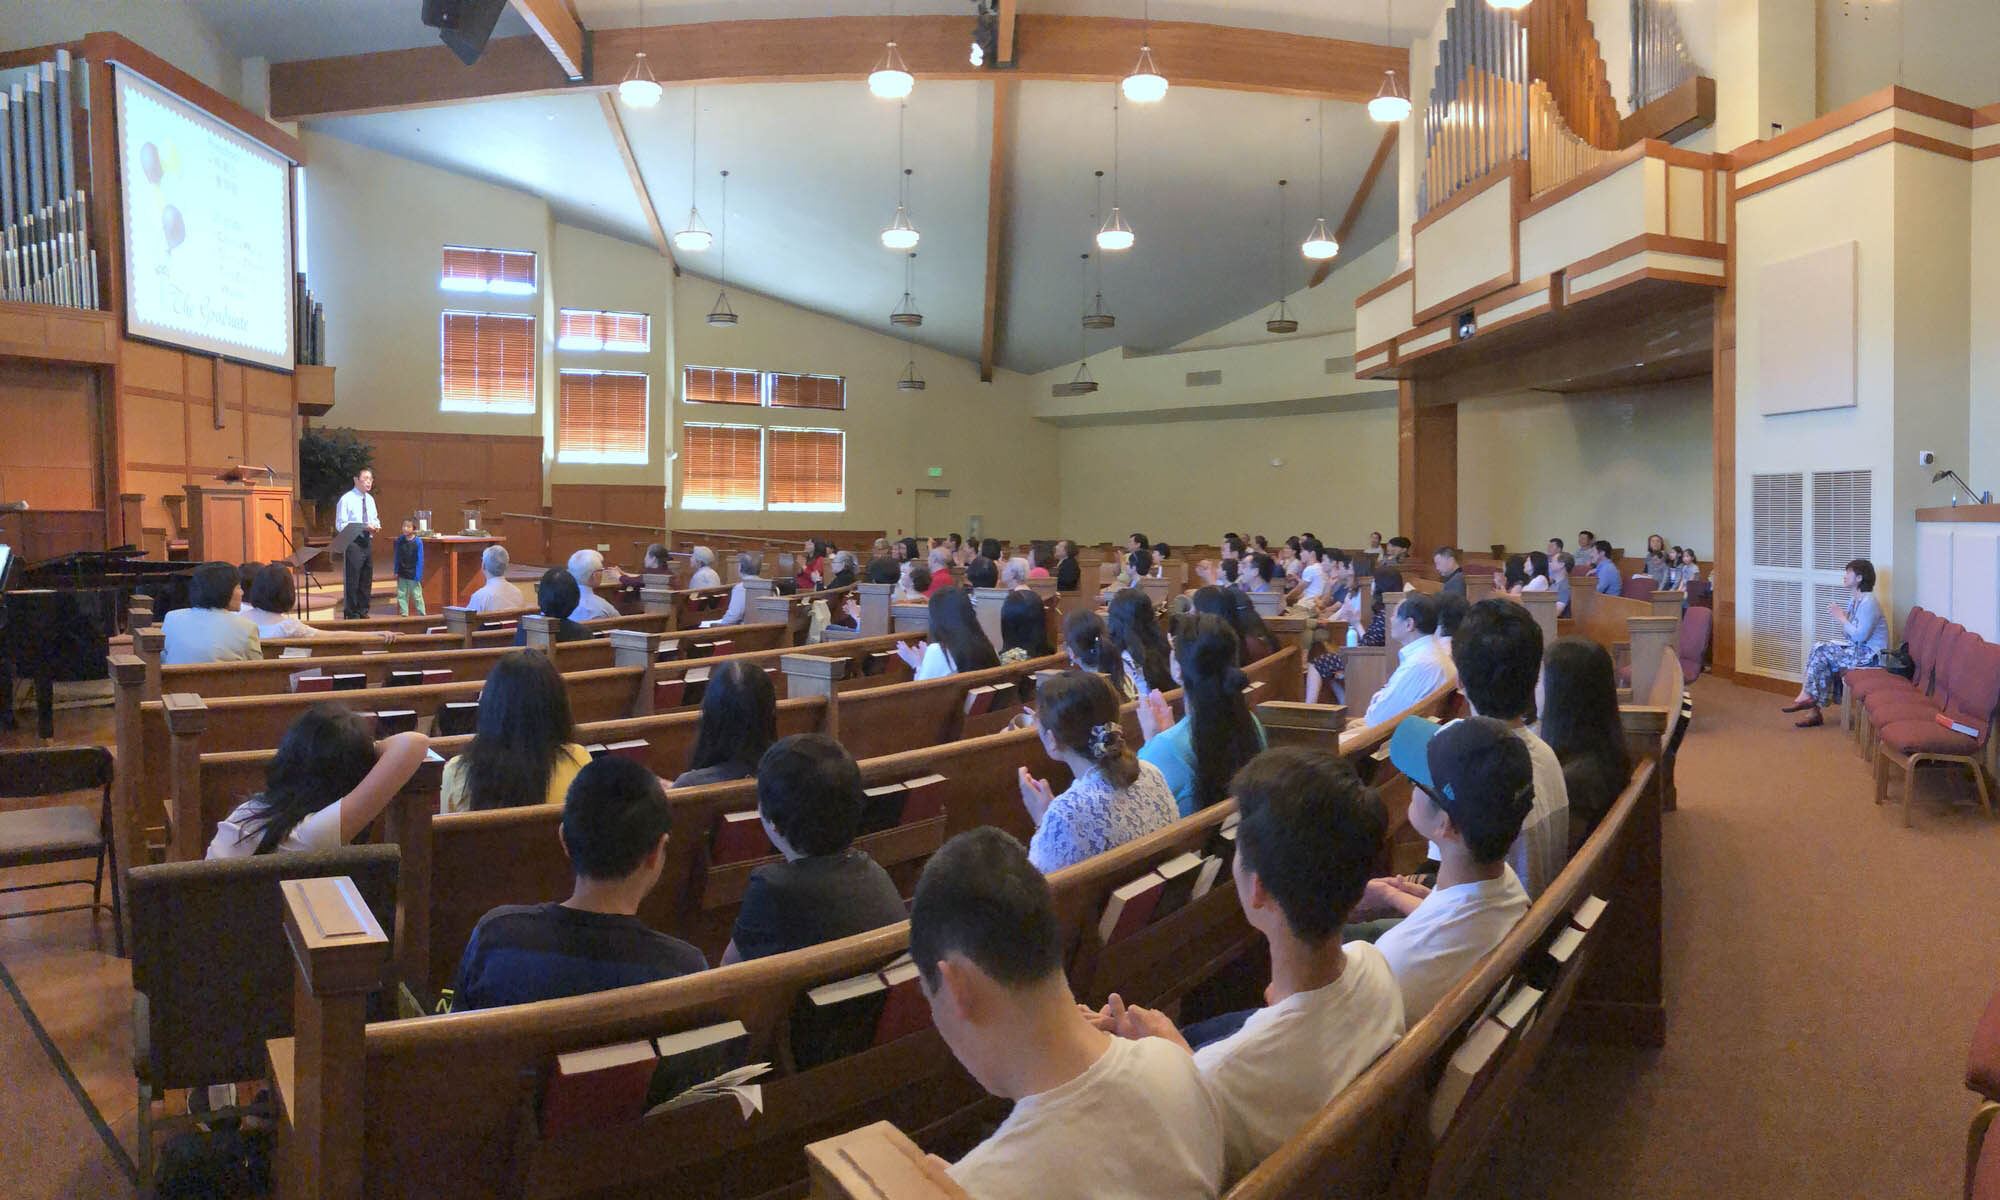 Sunday Service True Light Christian Church